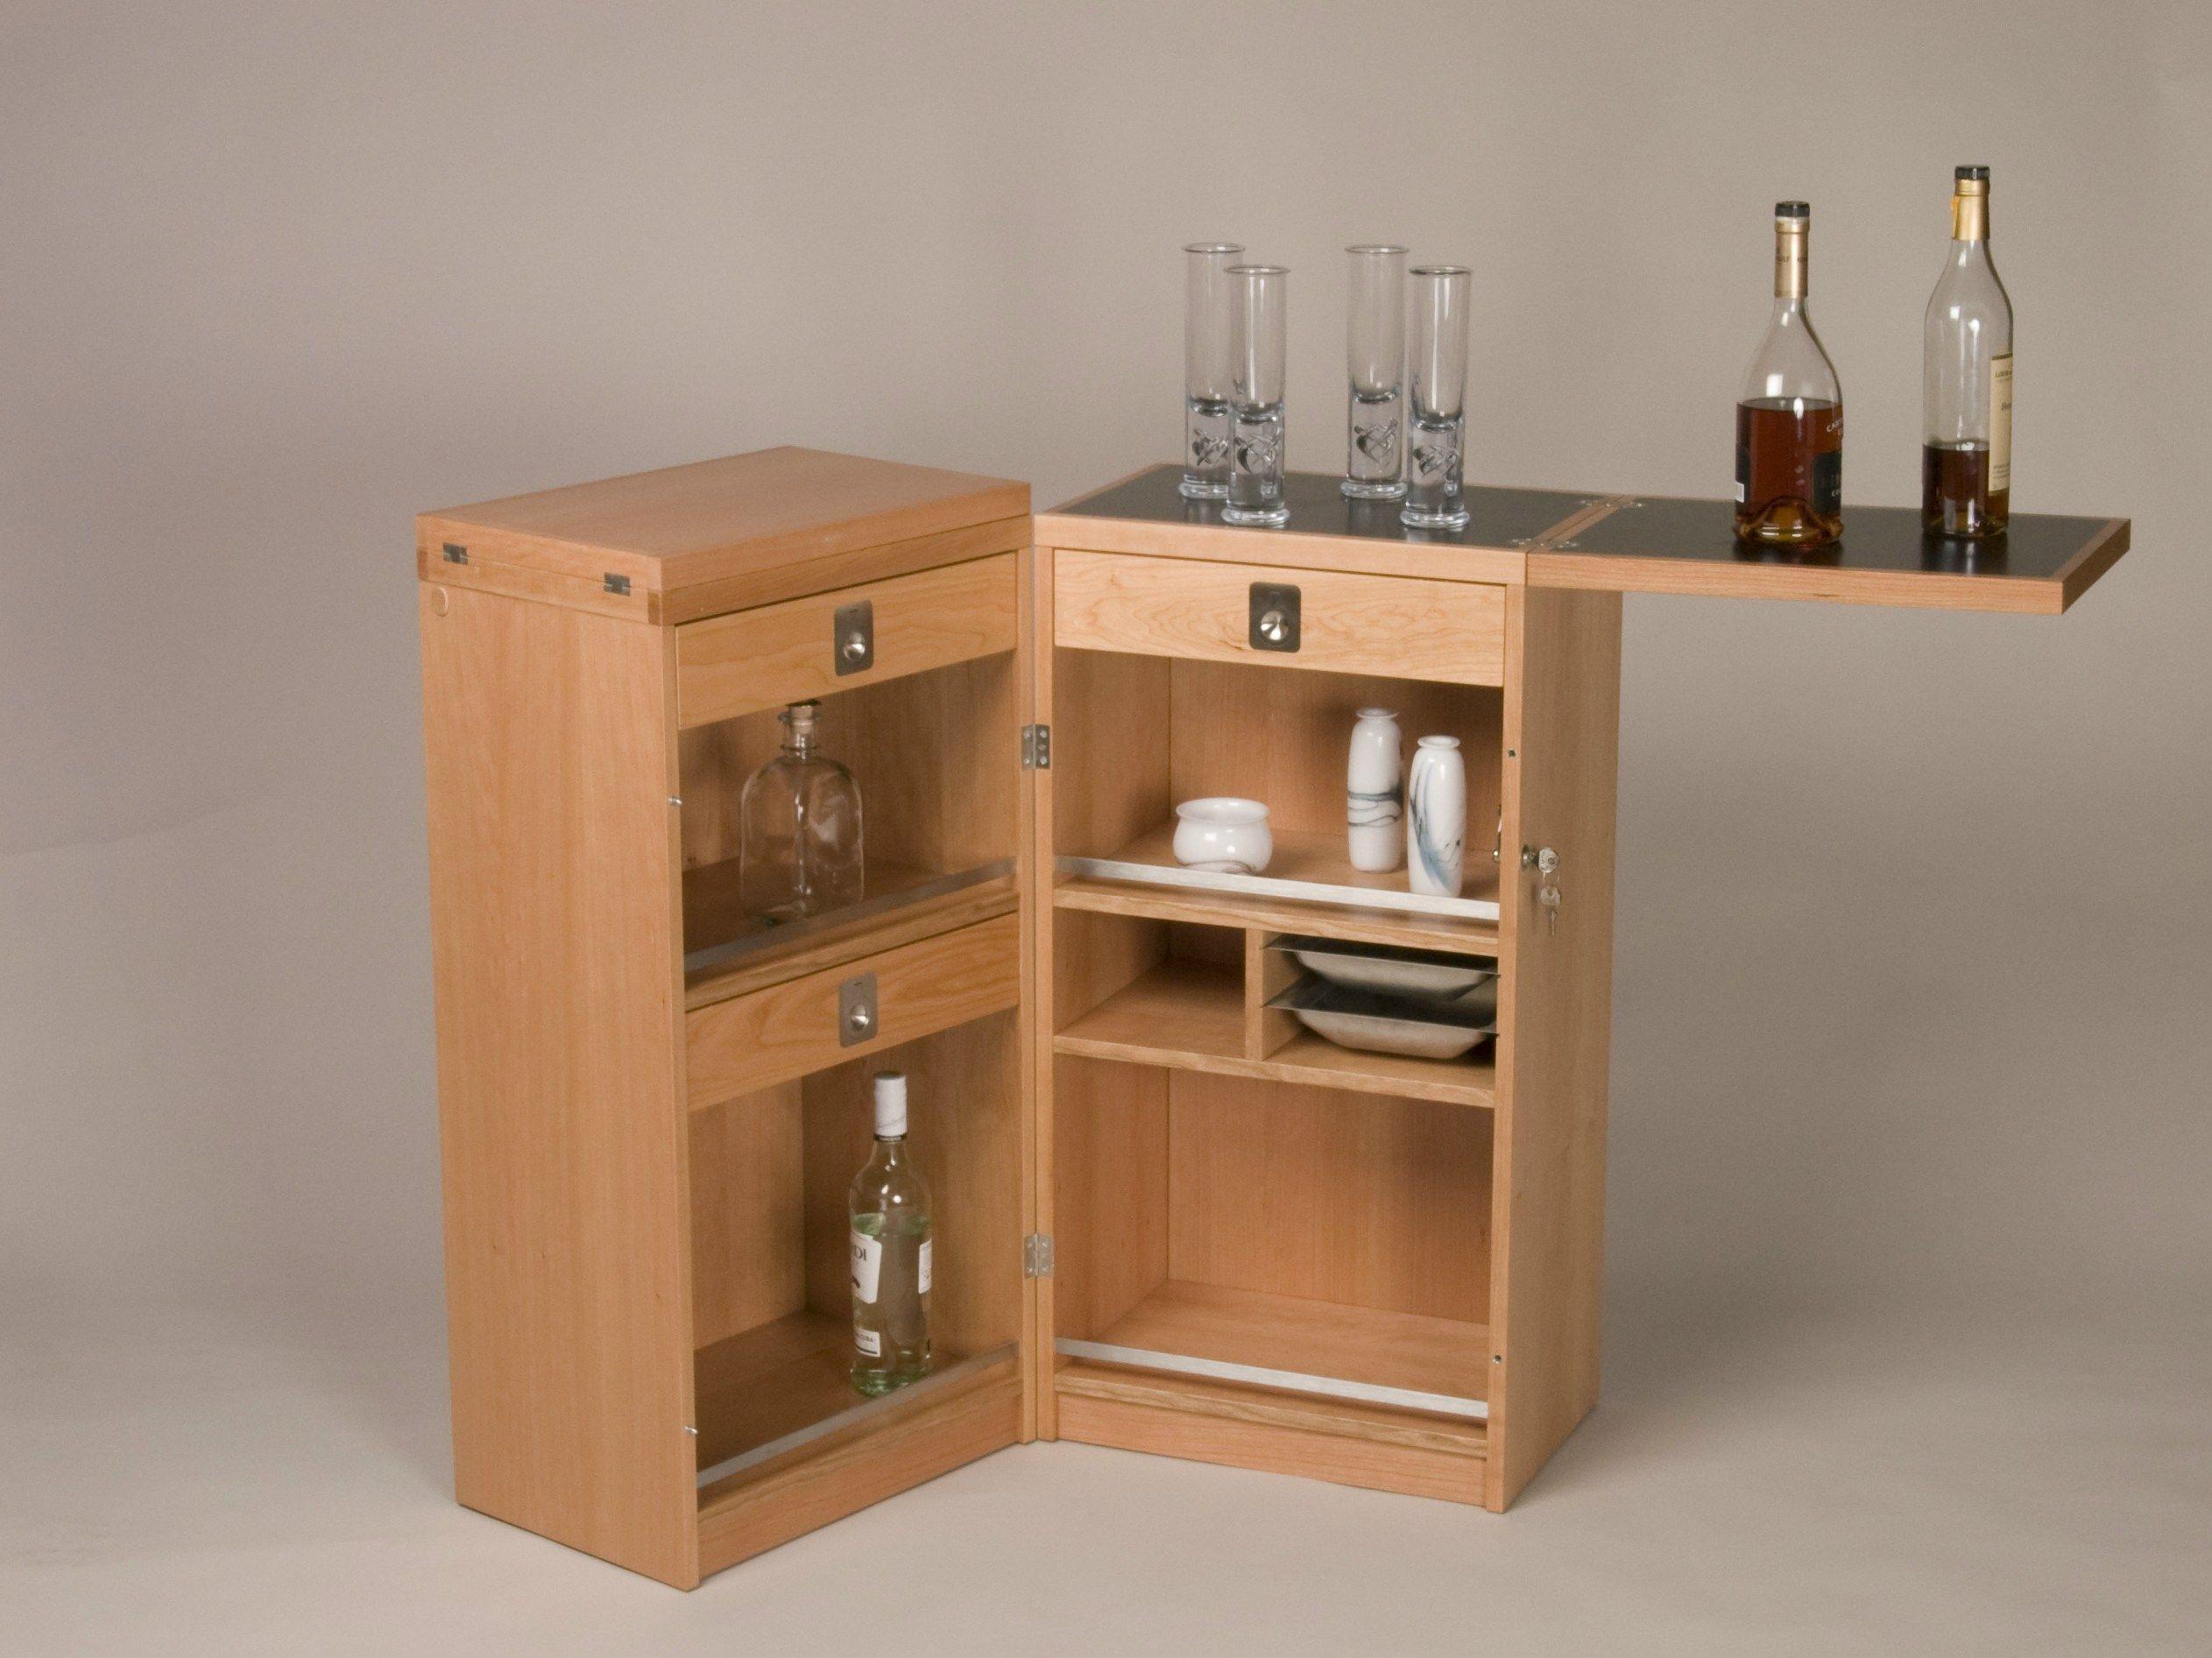 Mueble bar de madera 7712 bar by dyrlund for Bar rodante de madera